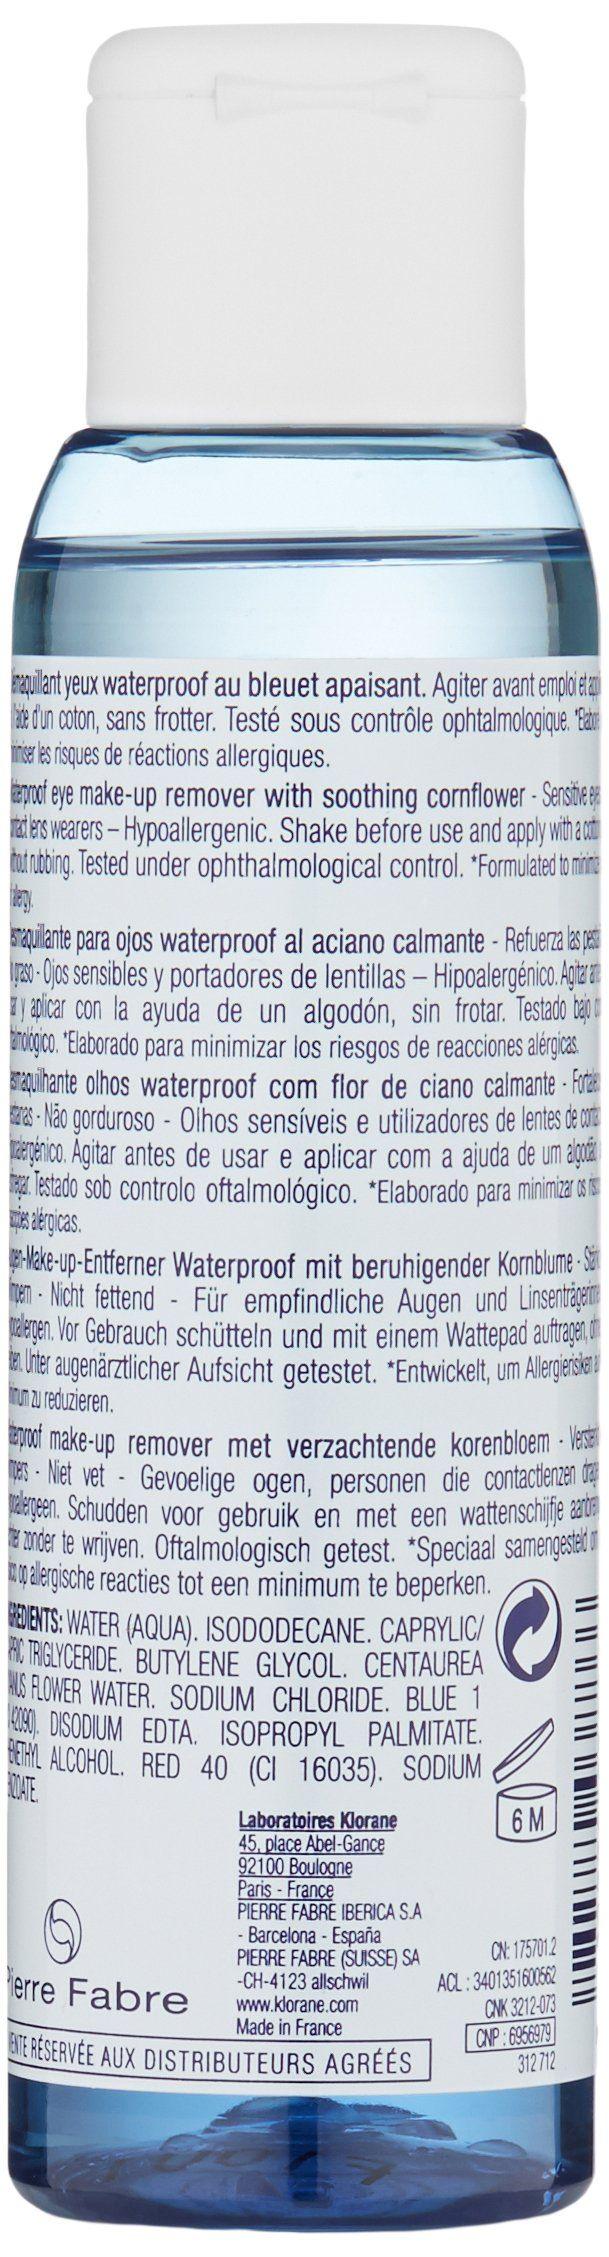 Klorane Waterproof Eye MakeUp Remover with Soothing